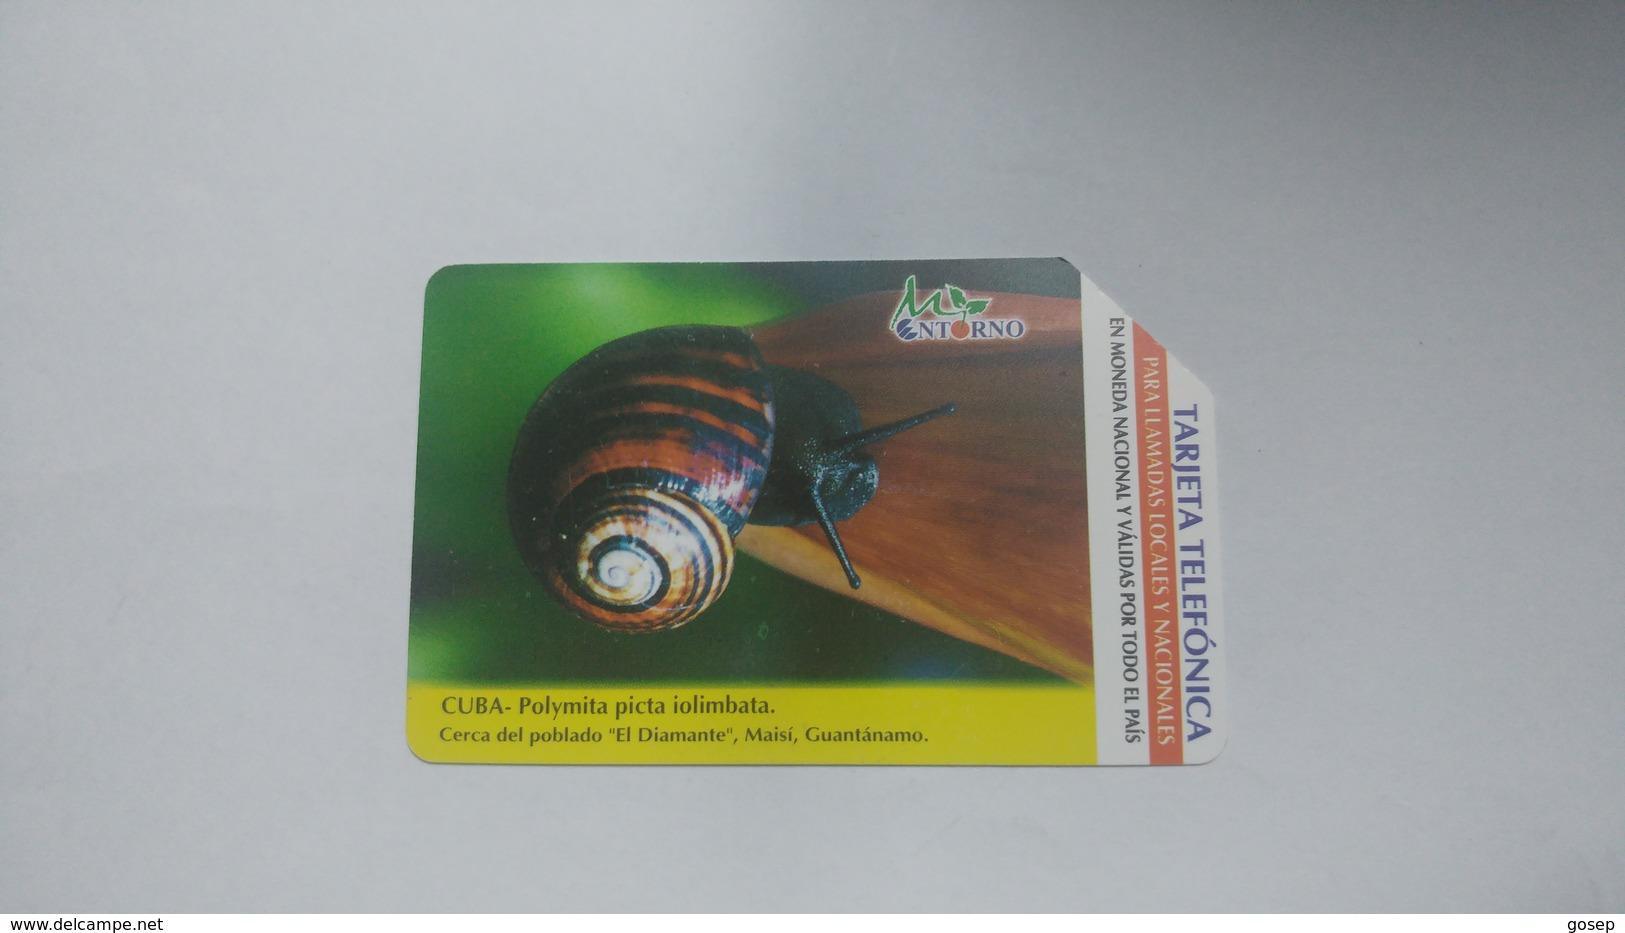 Cuba-polymita Picta Iolimbata-urmet-(5.00pesos)-used Card+1card Prepiad Free - Cuba